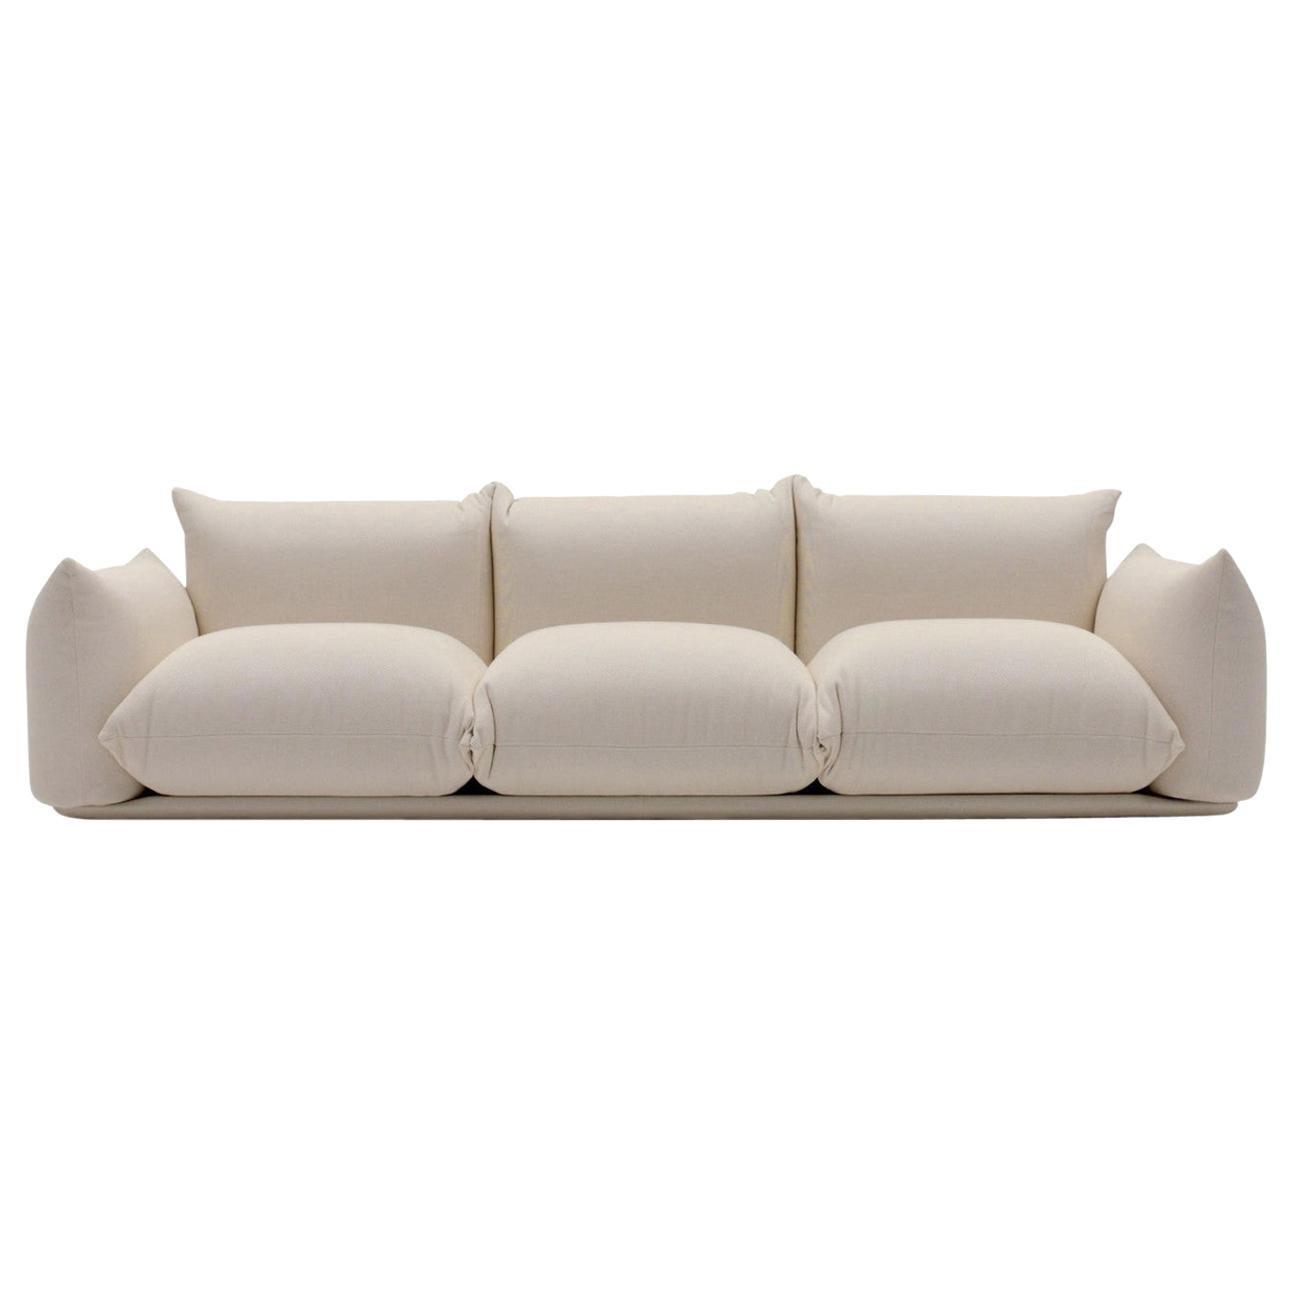 Arflex Marenco Sofa in Fabric Heidi and Candy by Mario Marenco